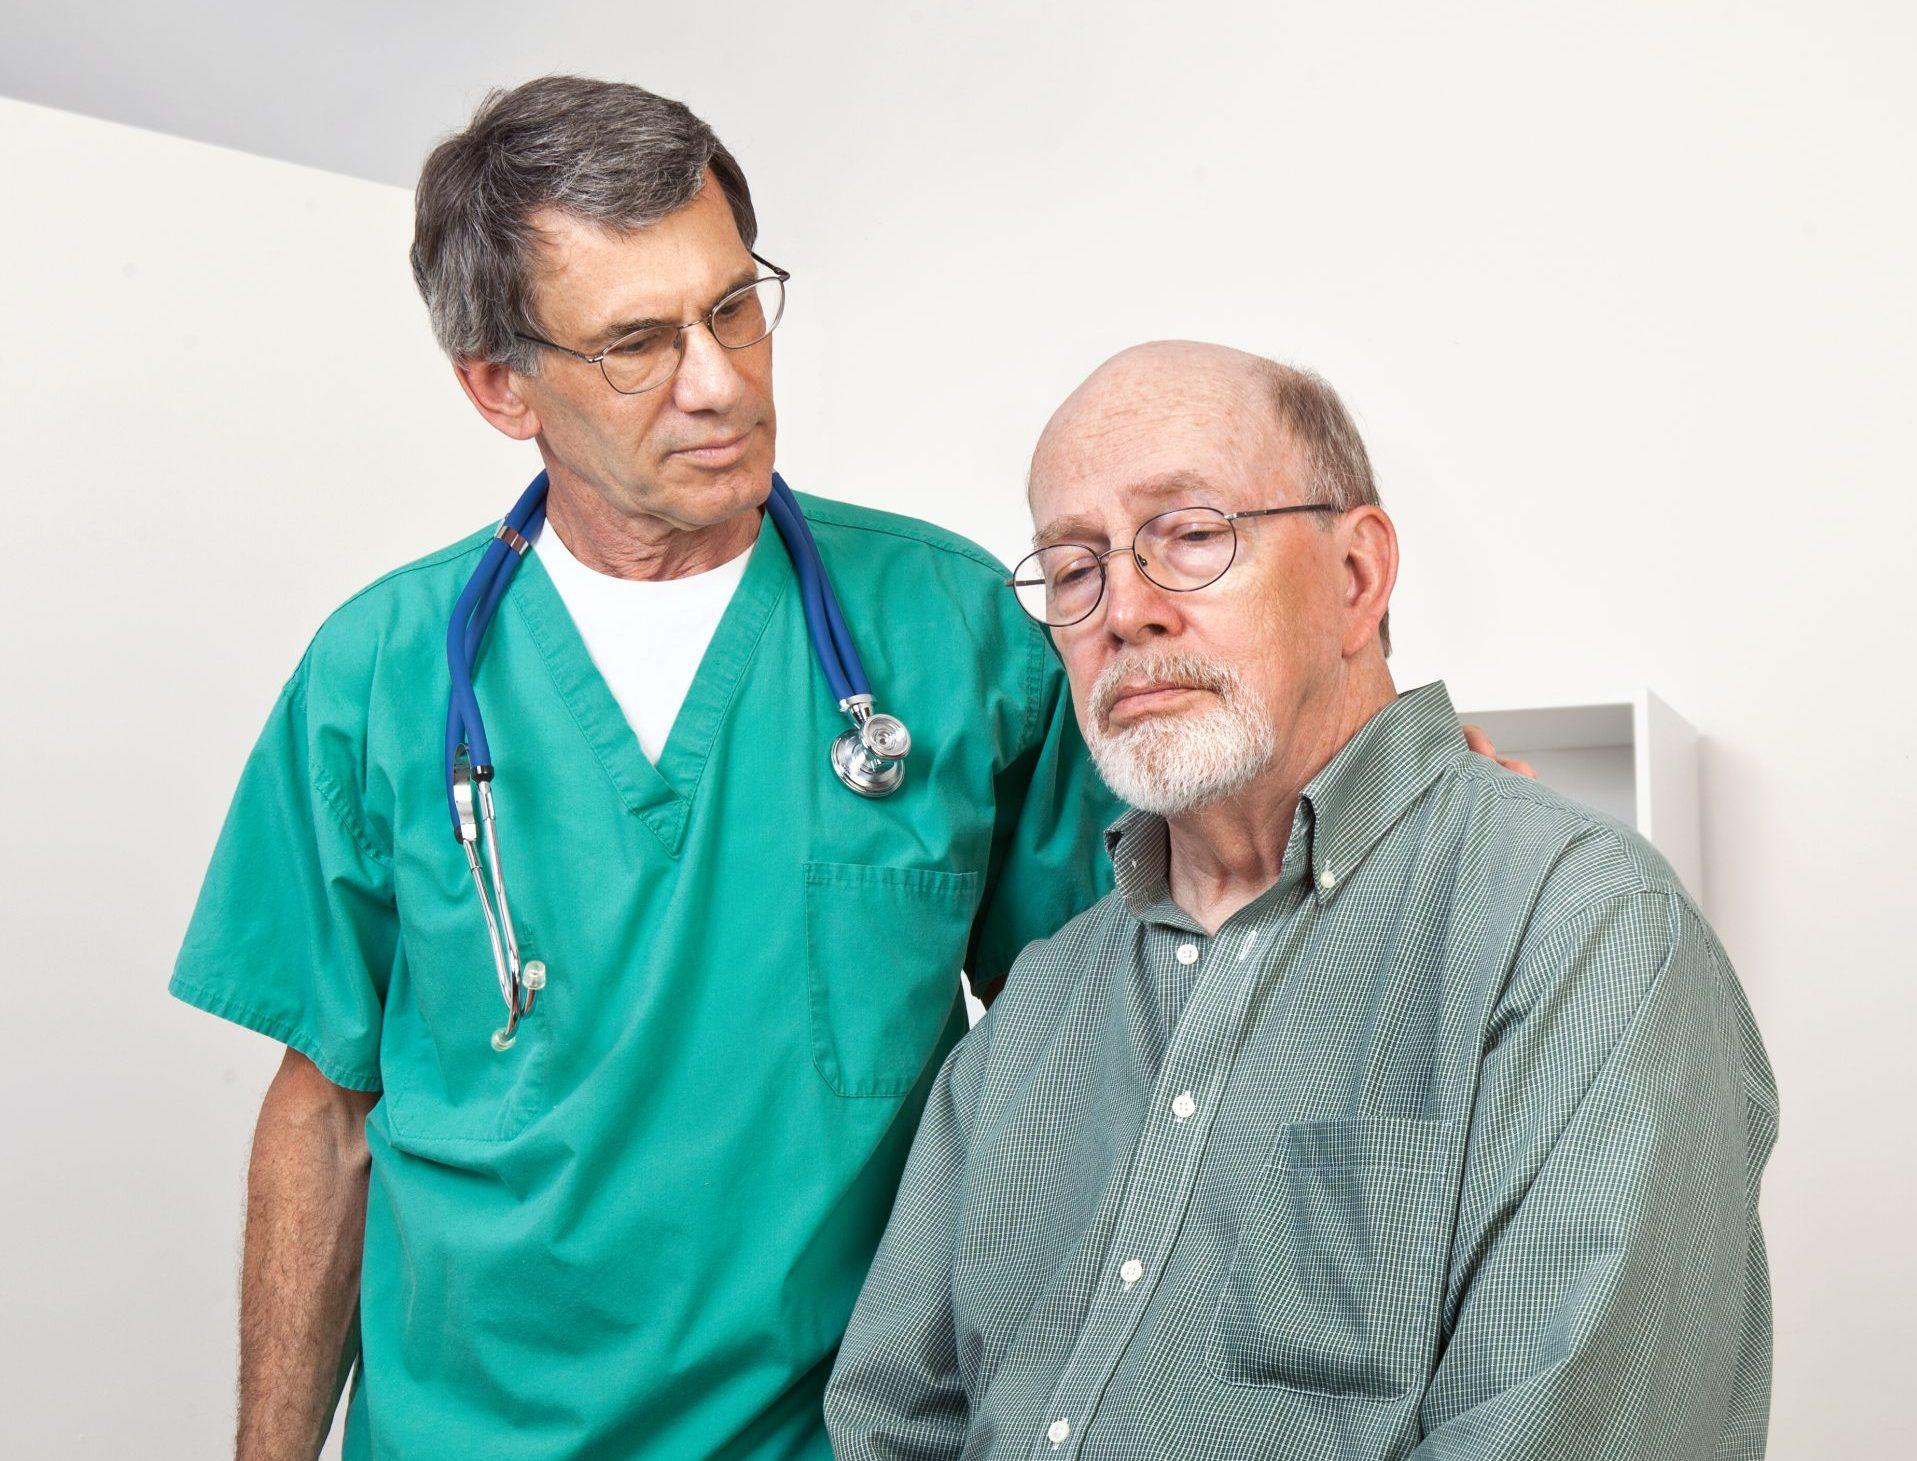 Причины и лечение водянки яичка у мужчин